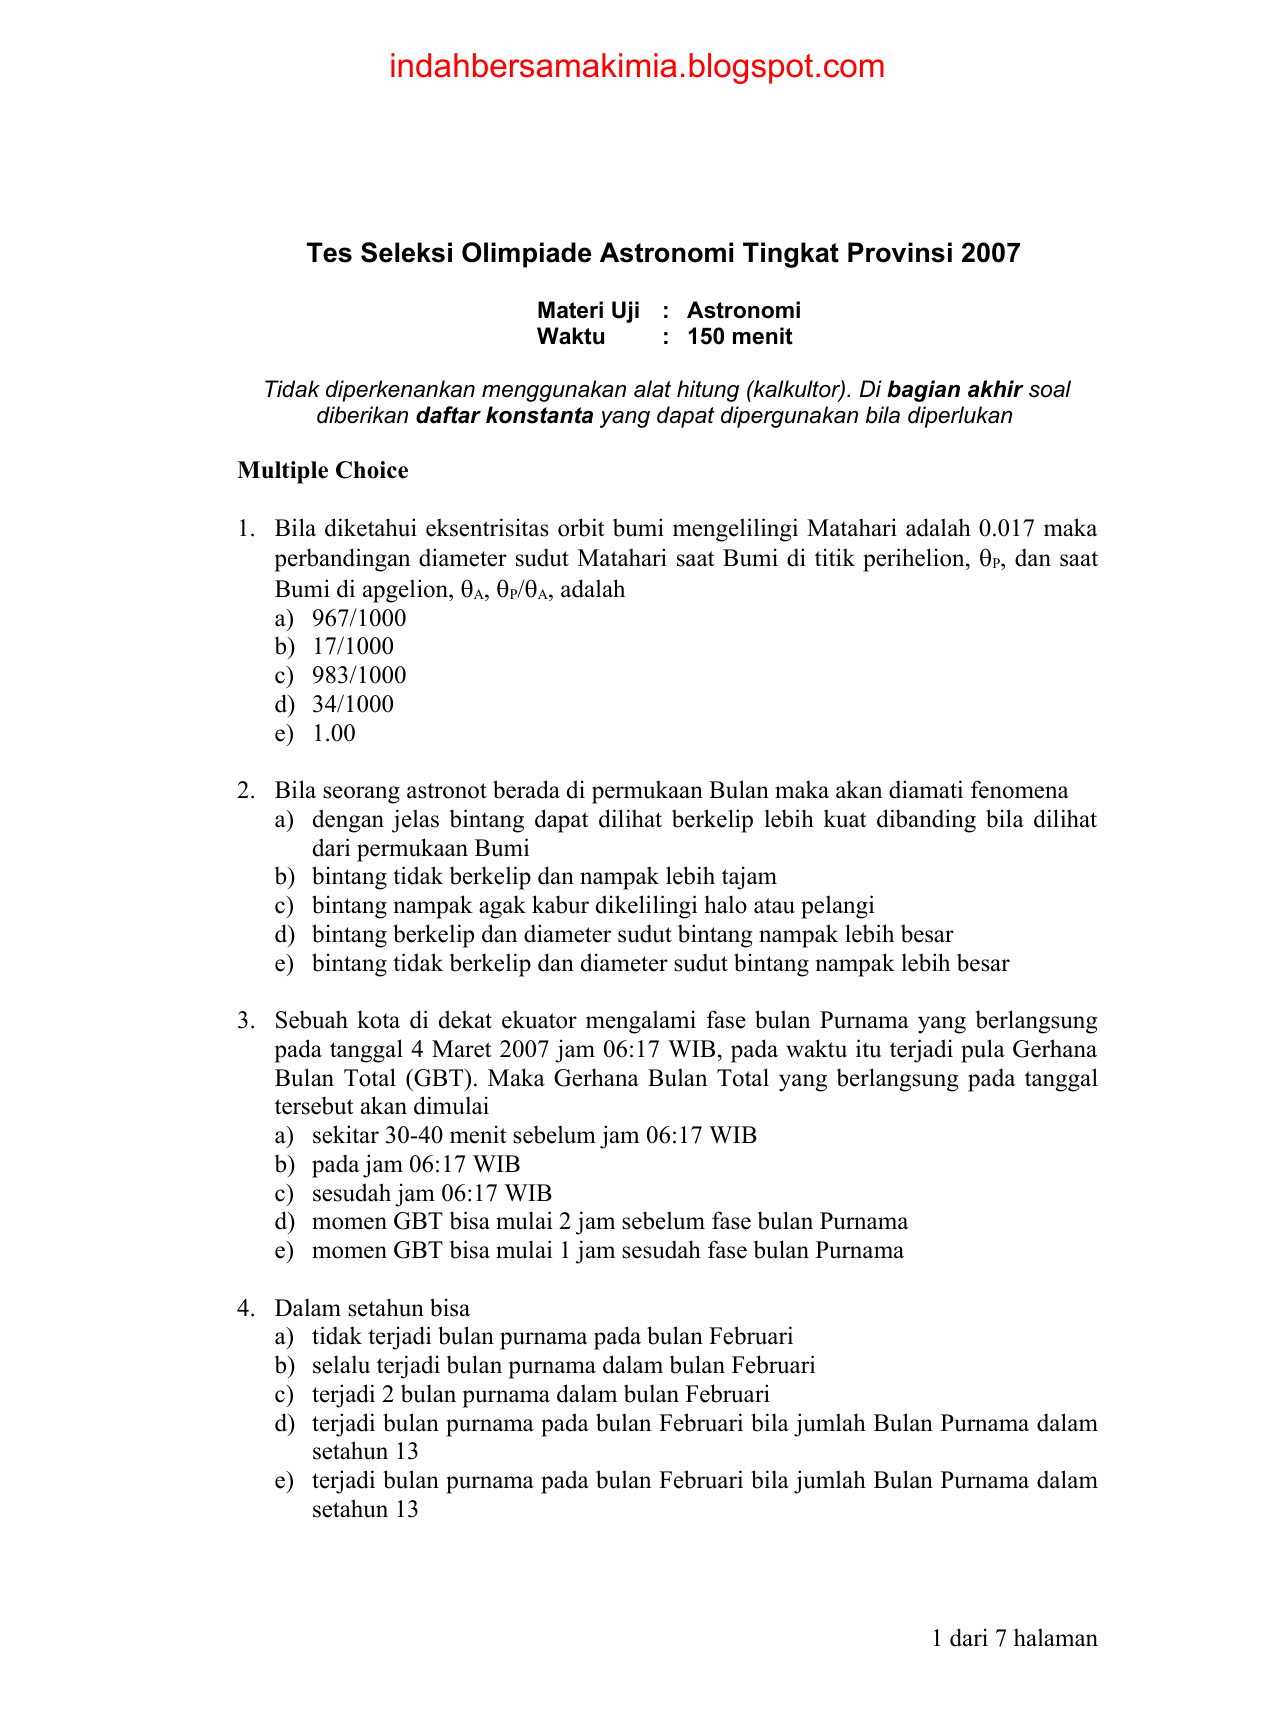 Tes Seleksi Olimpiade Astronomi Tingkat Provinsi 2007